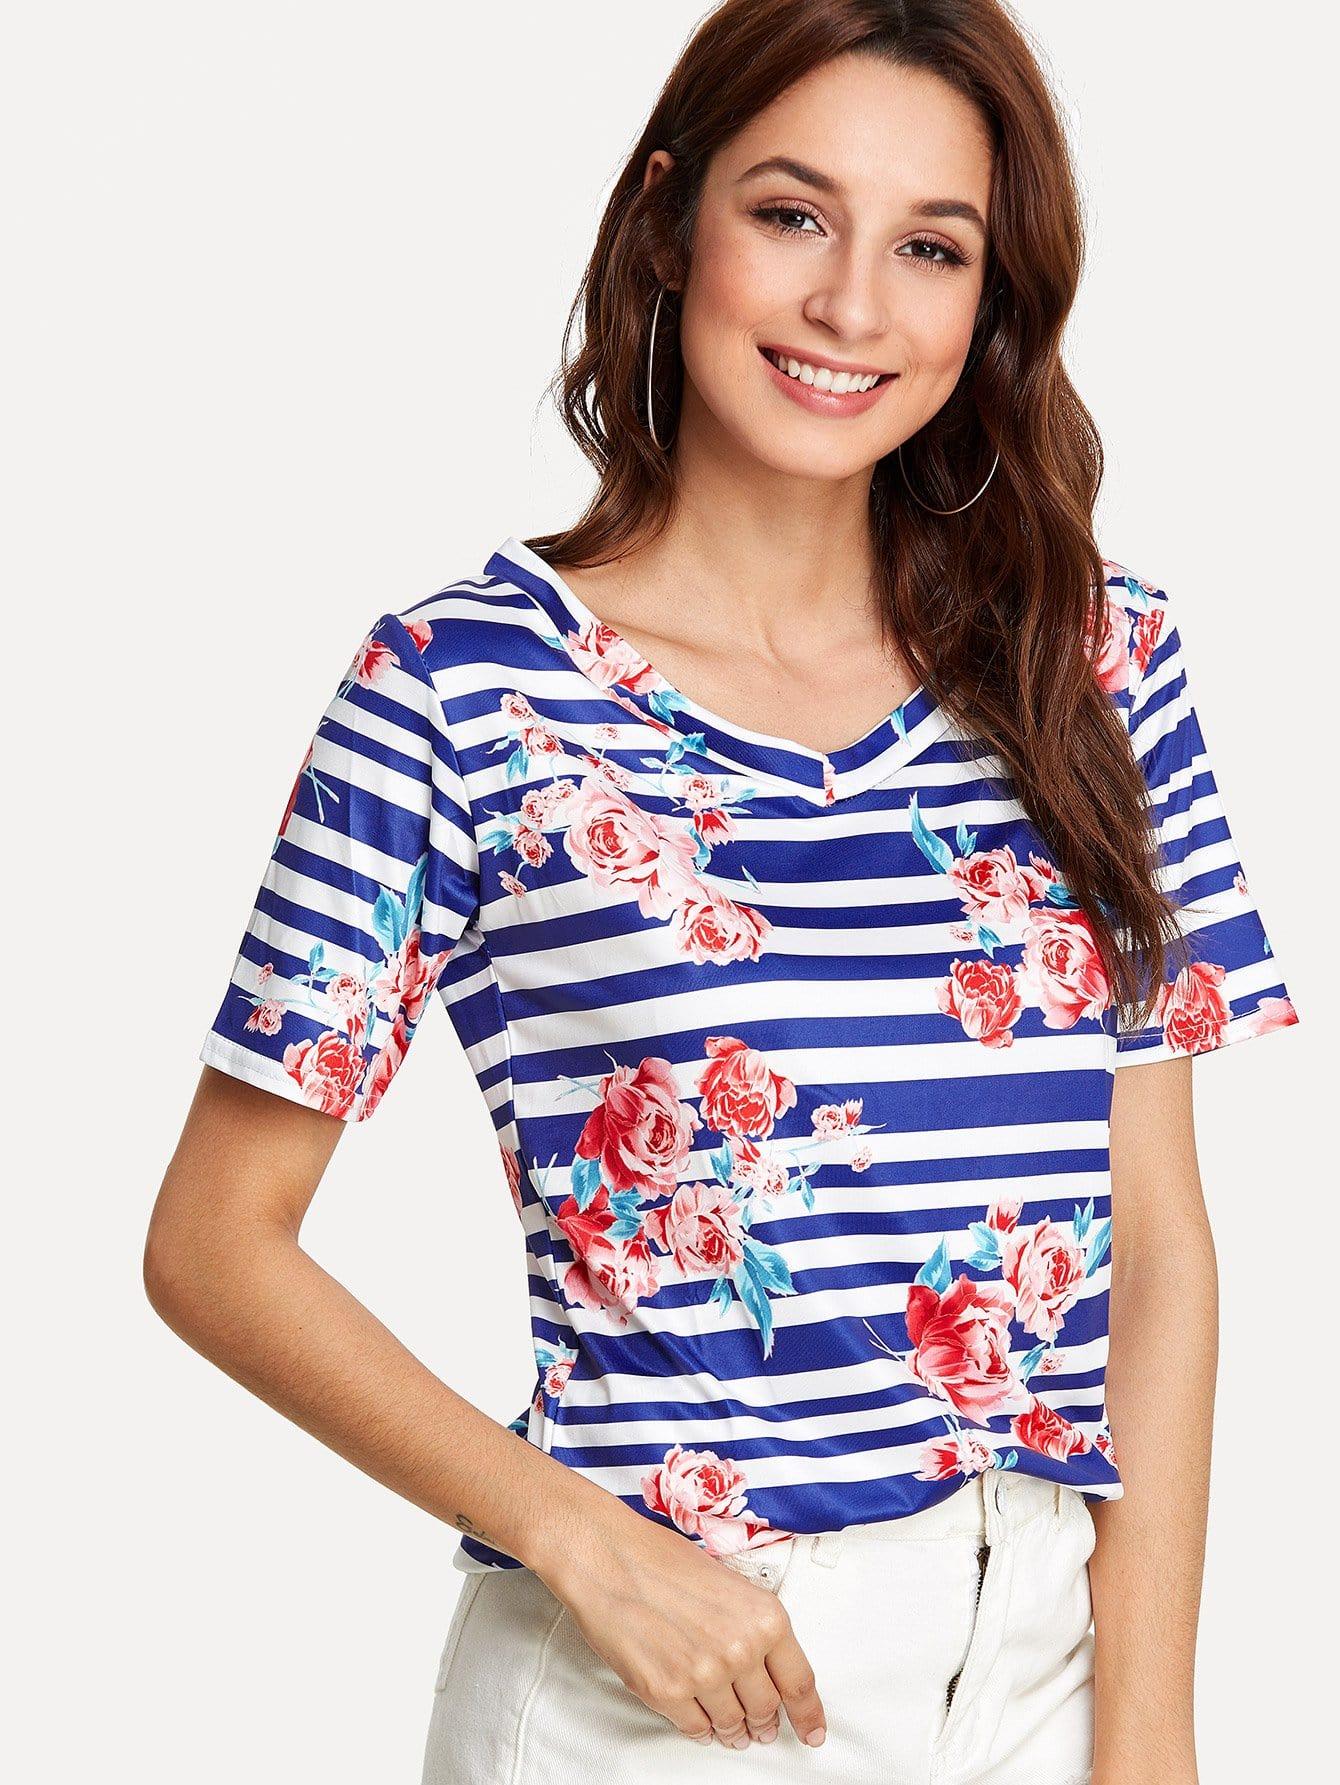 Stripe & Flower Print T-shirt redfox футболка flower t 42 4300 желтый